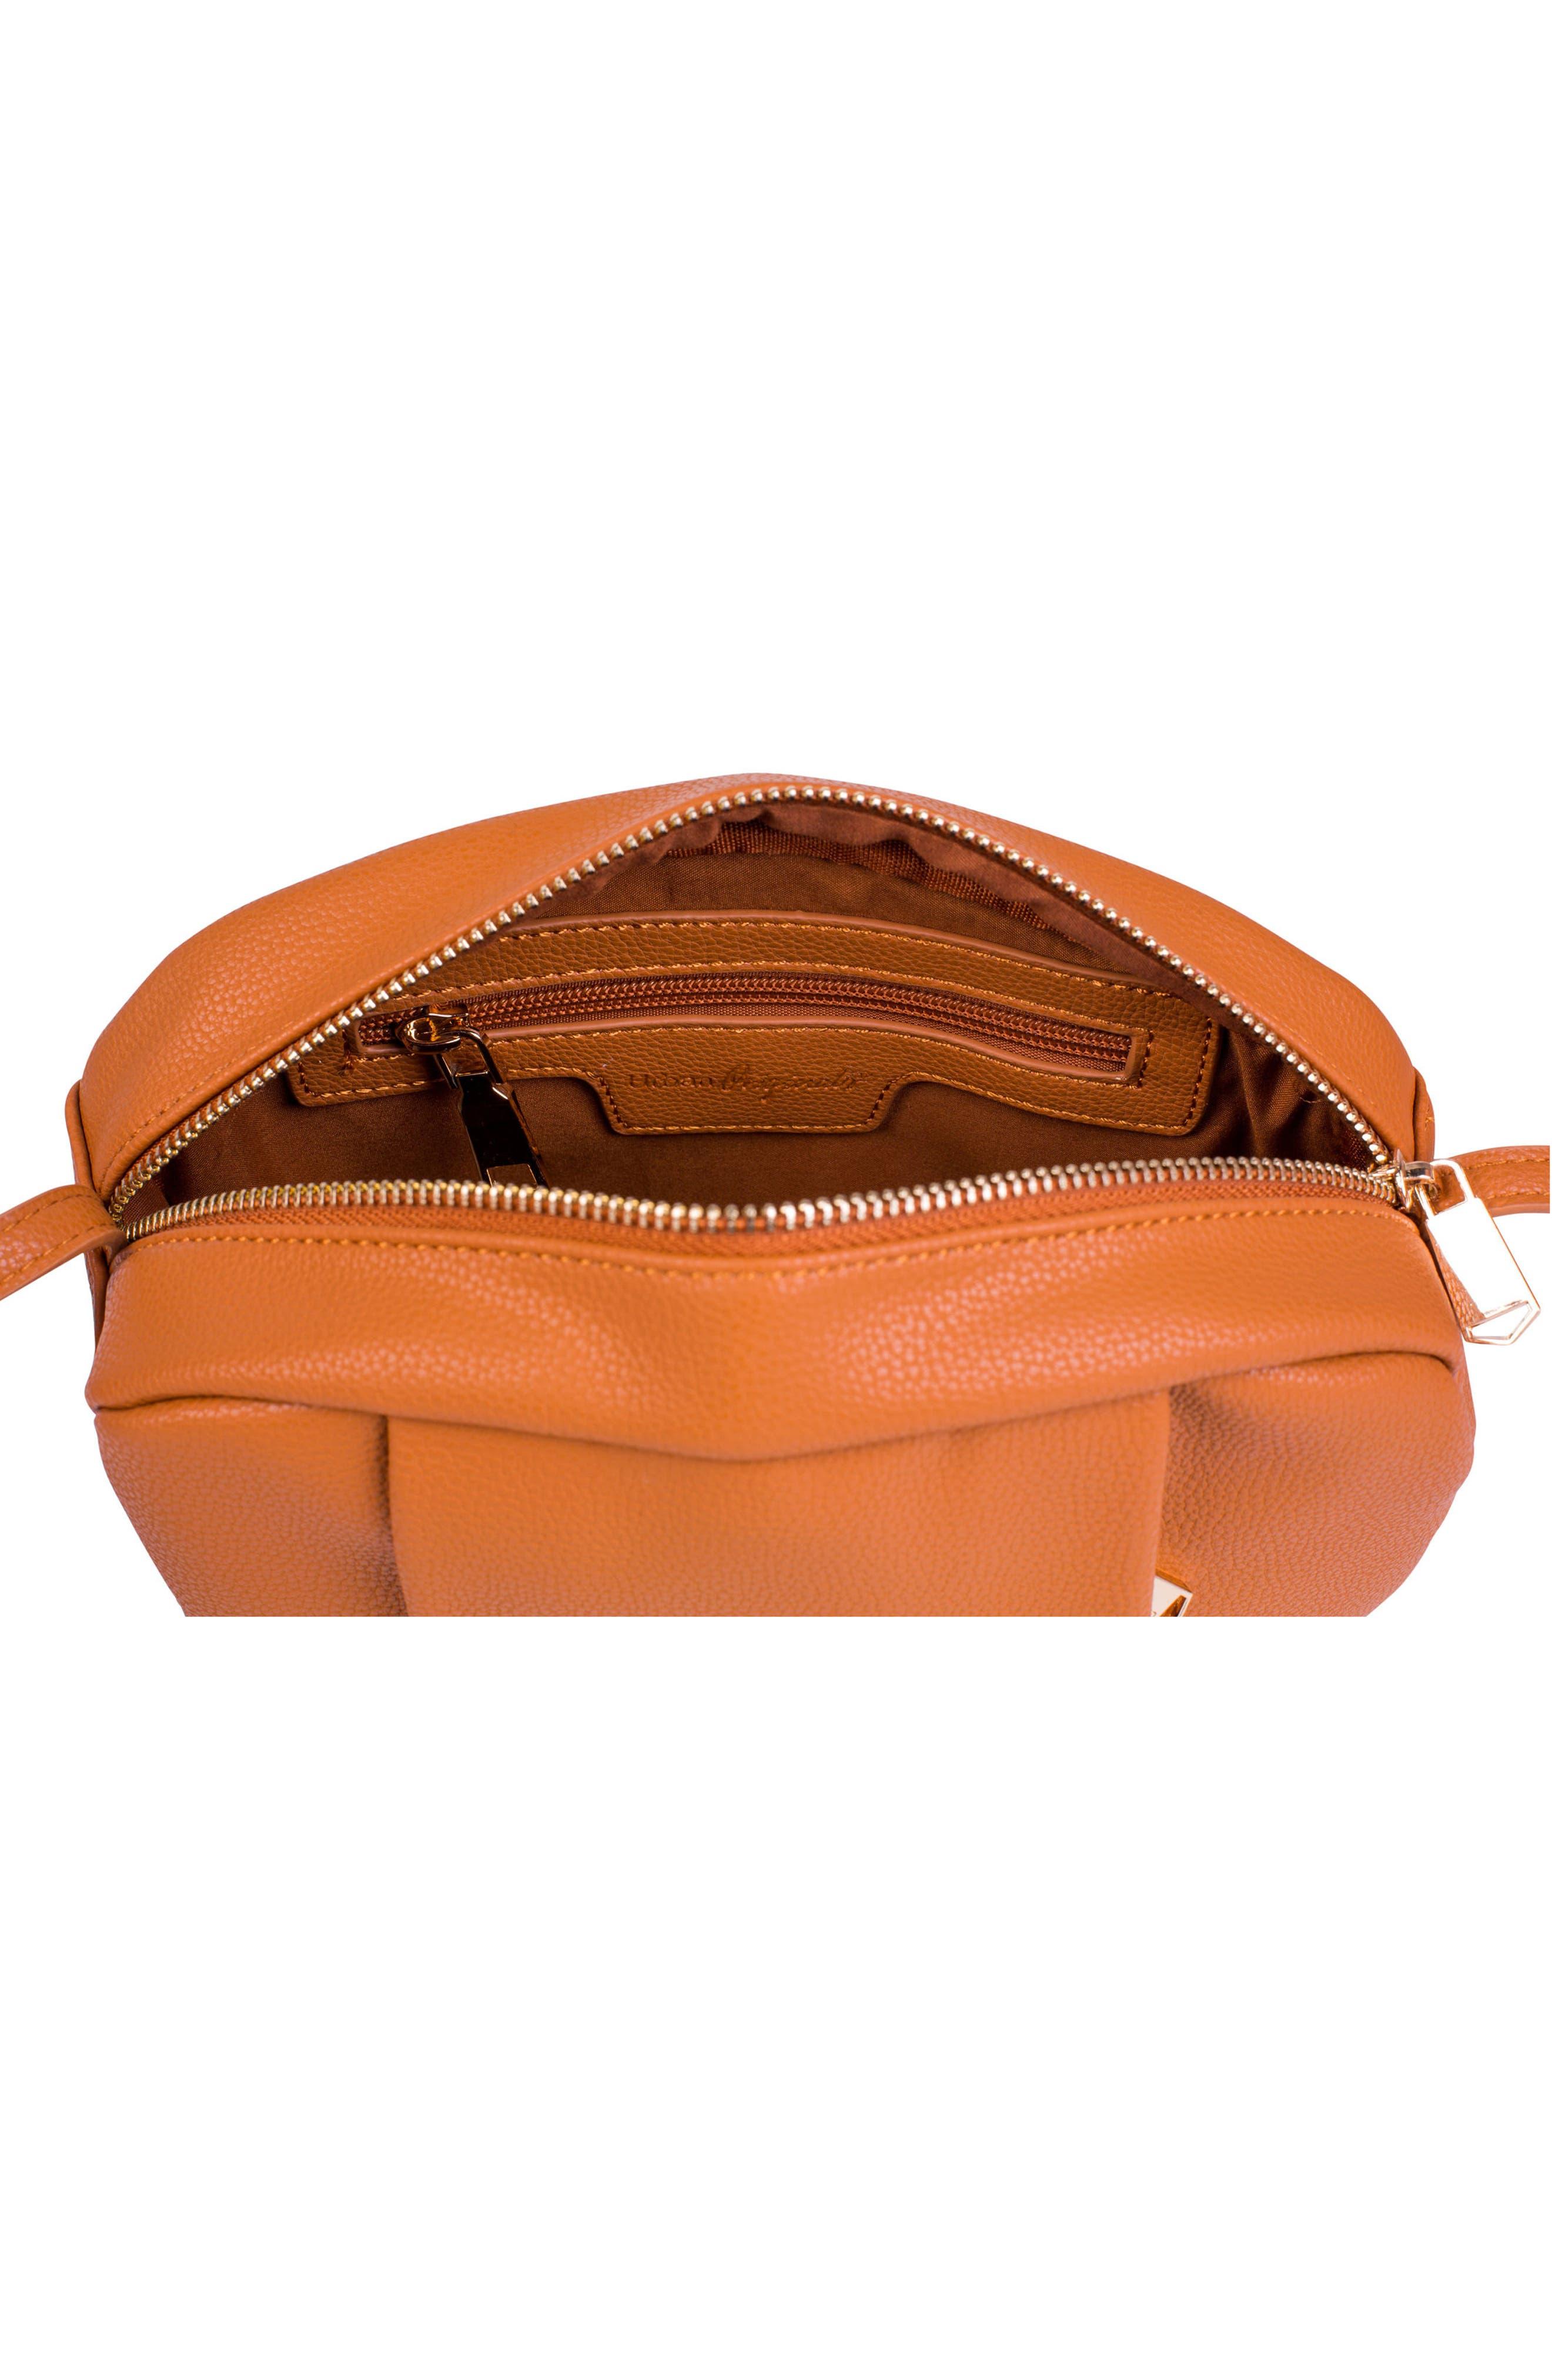 Story Teller Vegan Leather Crossbody Bag,                             Alternate thumbnail 2, color,                             Tan